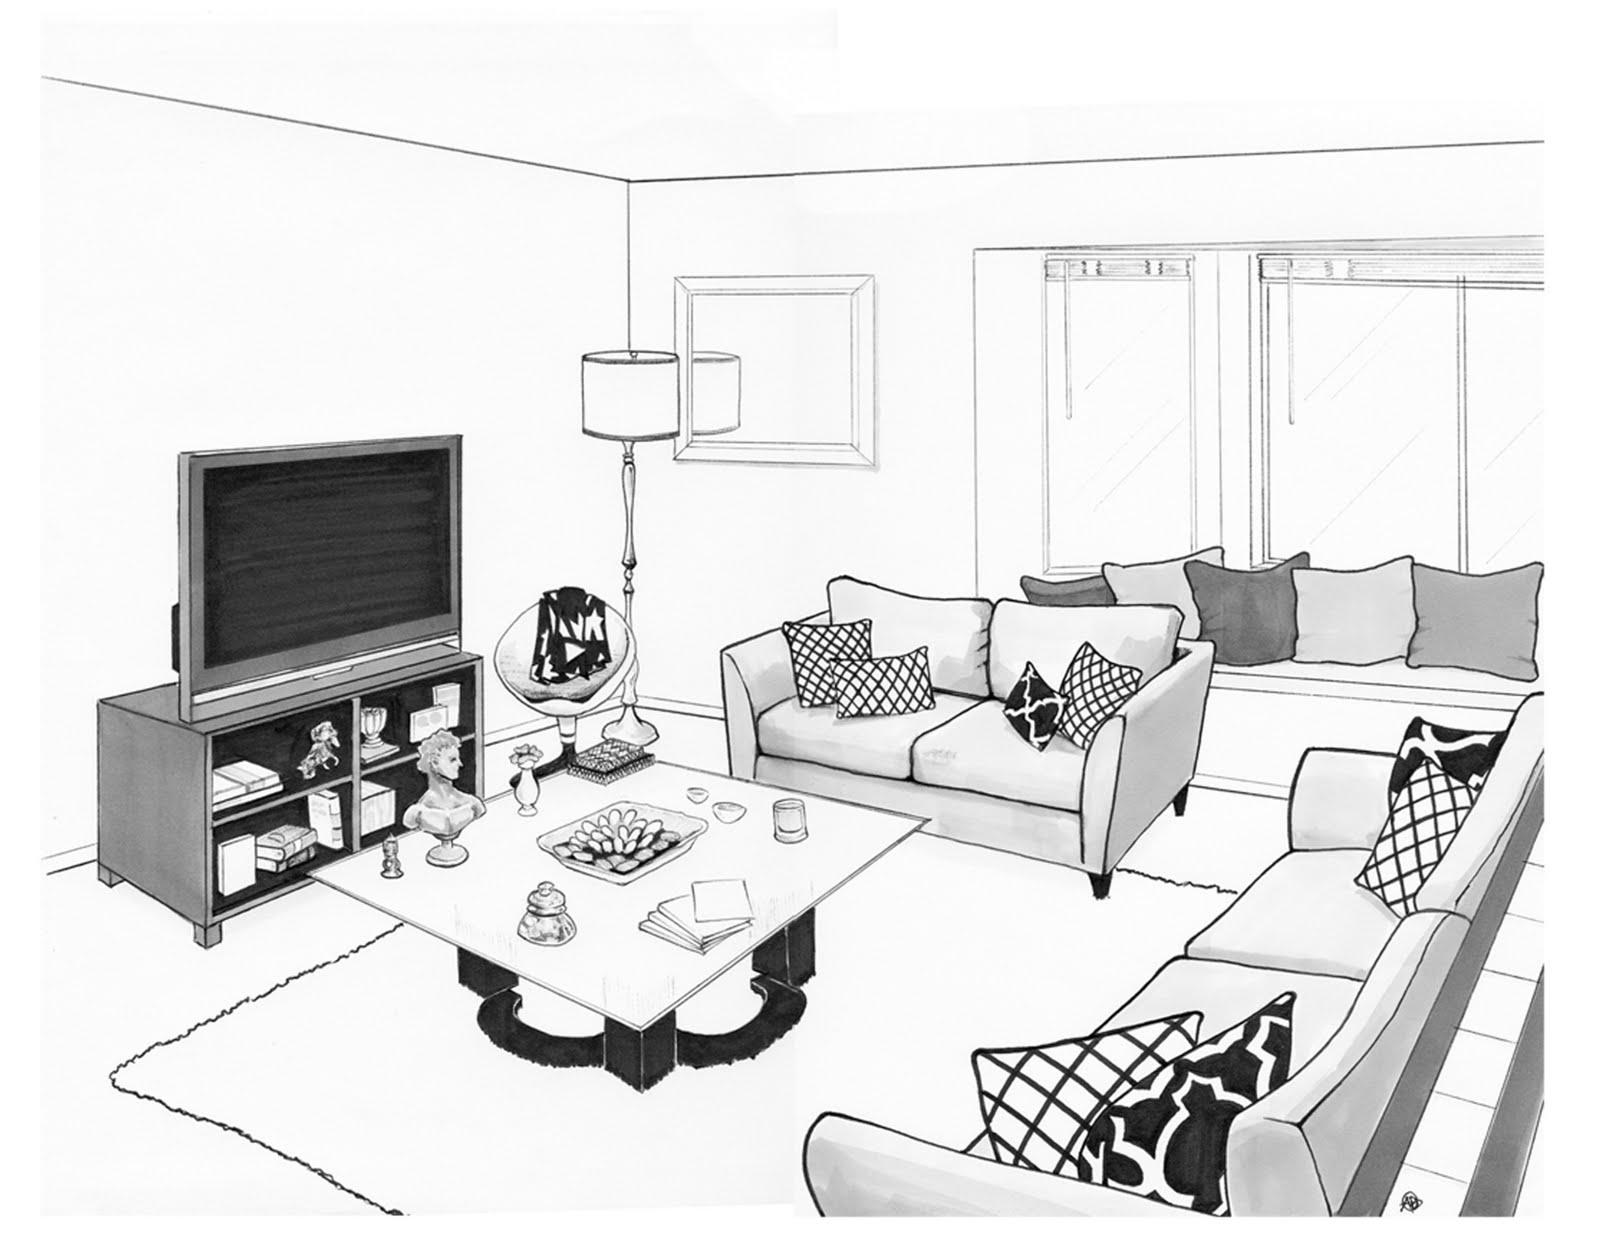 Drawn room cartoon house Room Drawing 2017 Beautiful Drawing